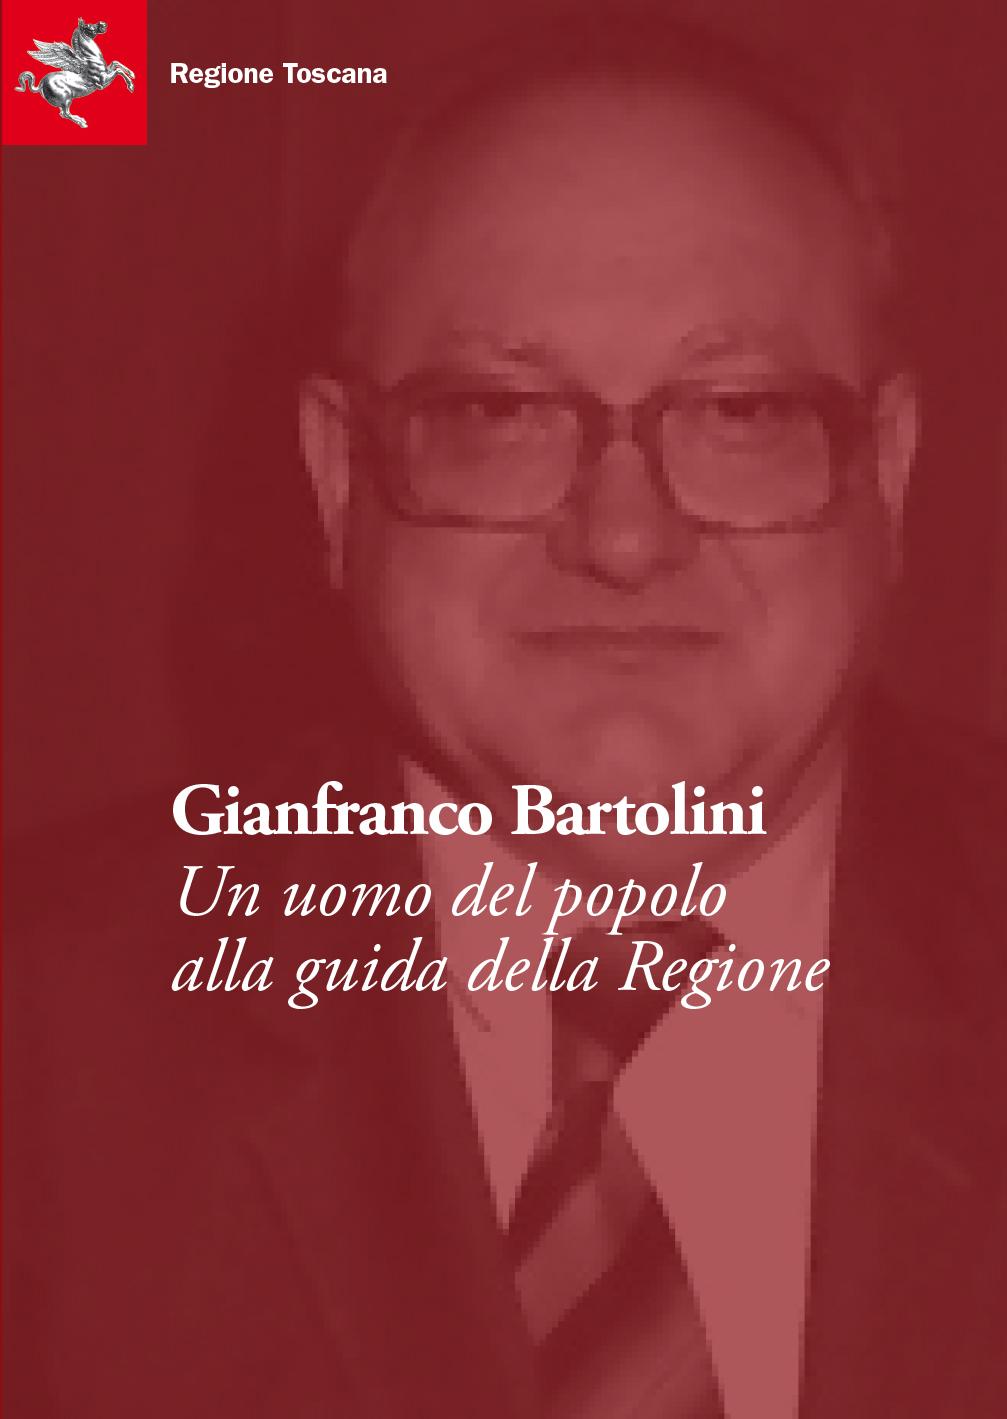 Gianfranco Bartolini